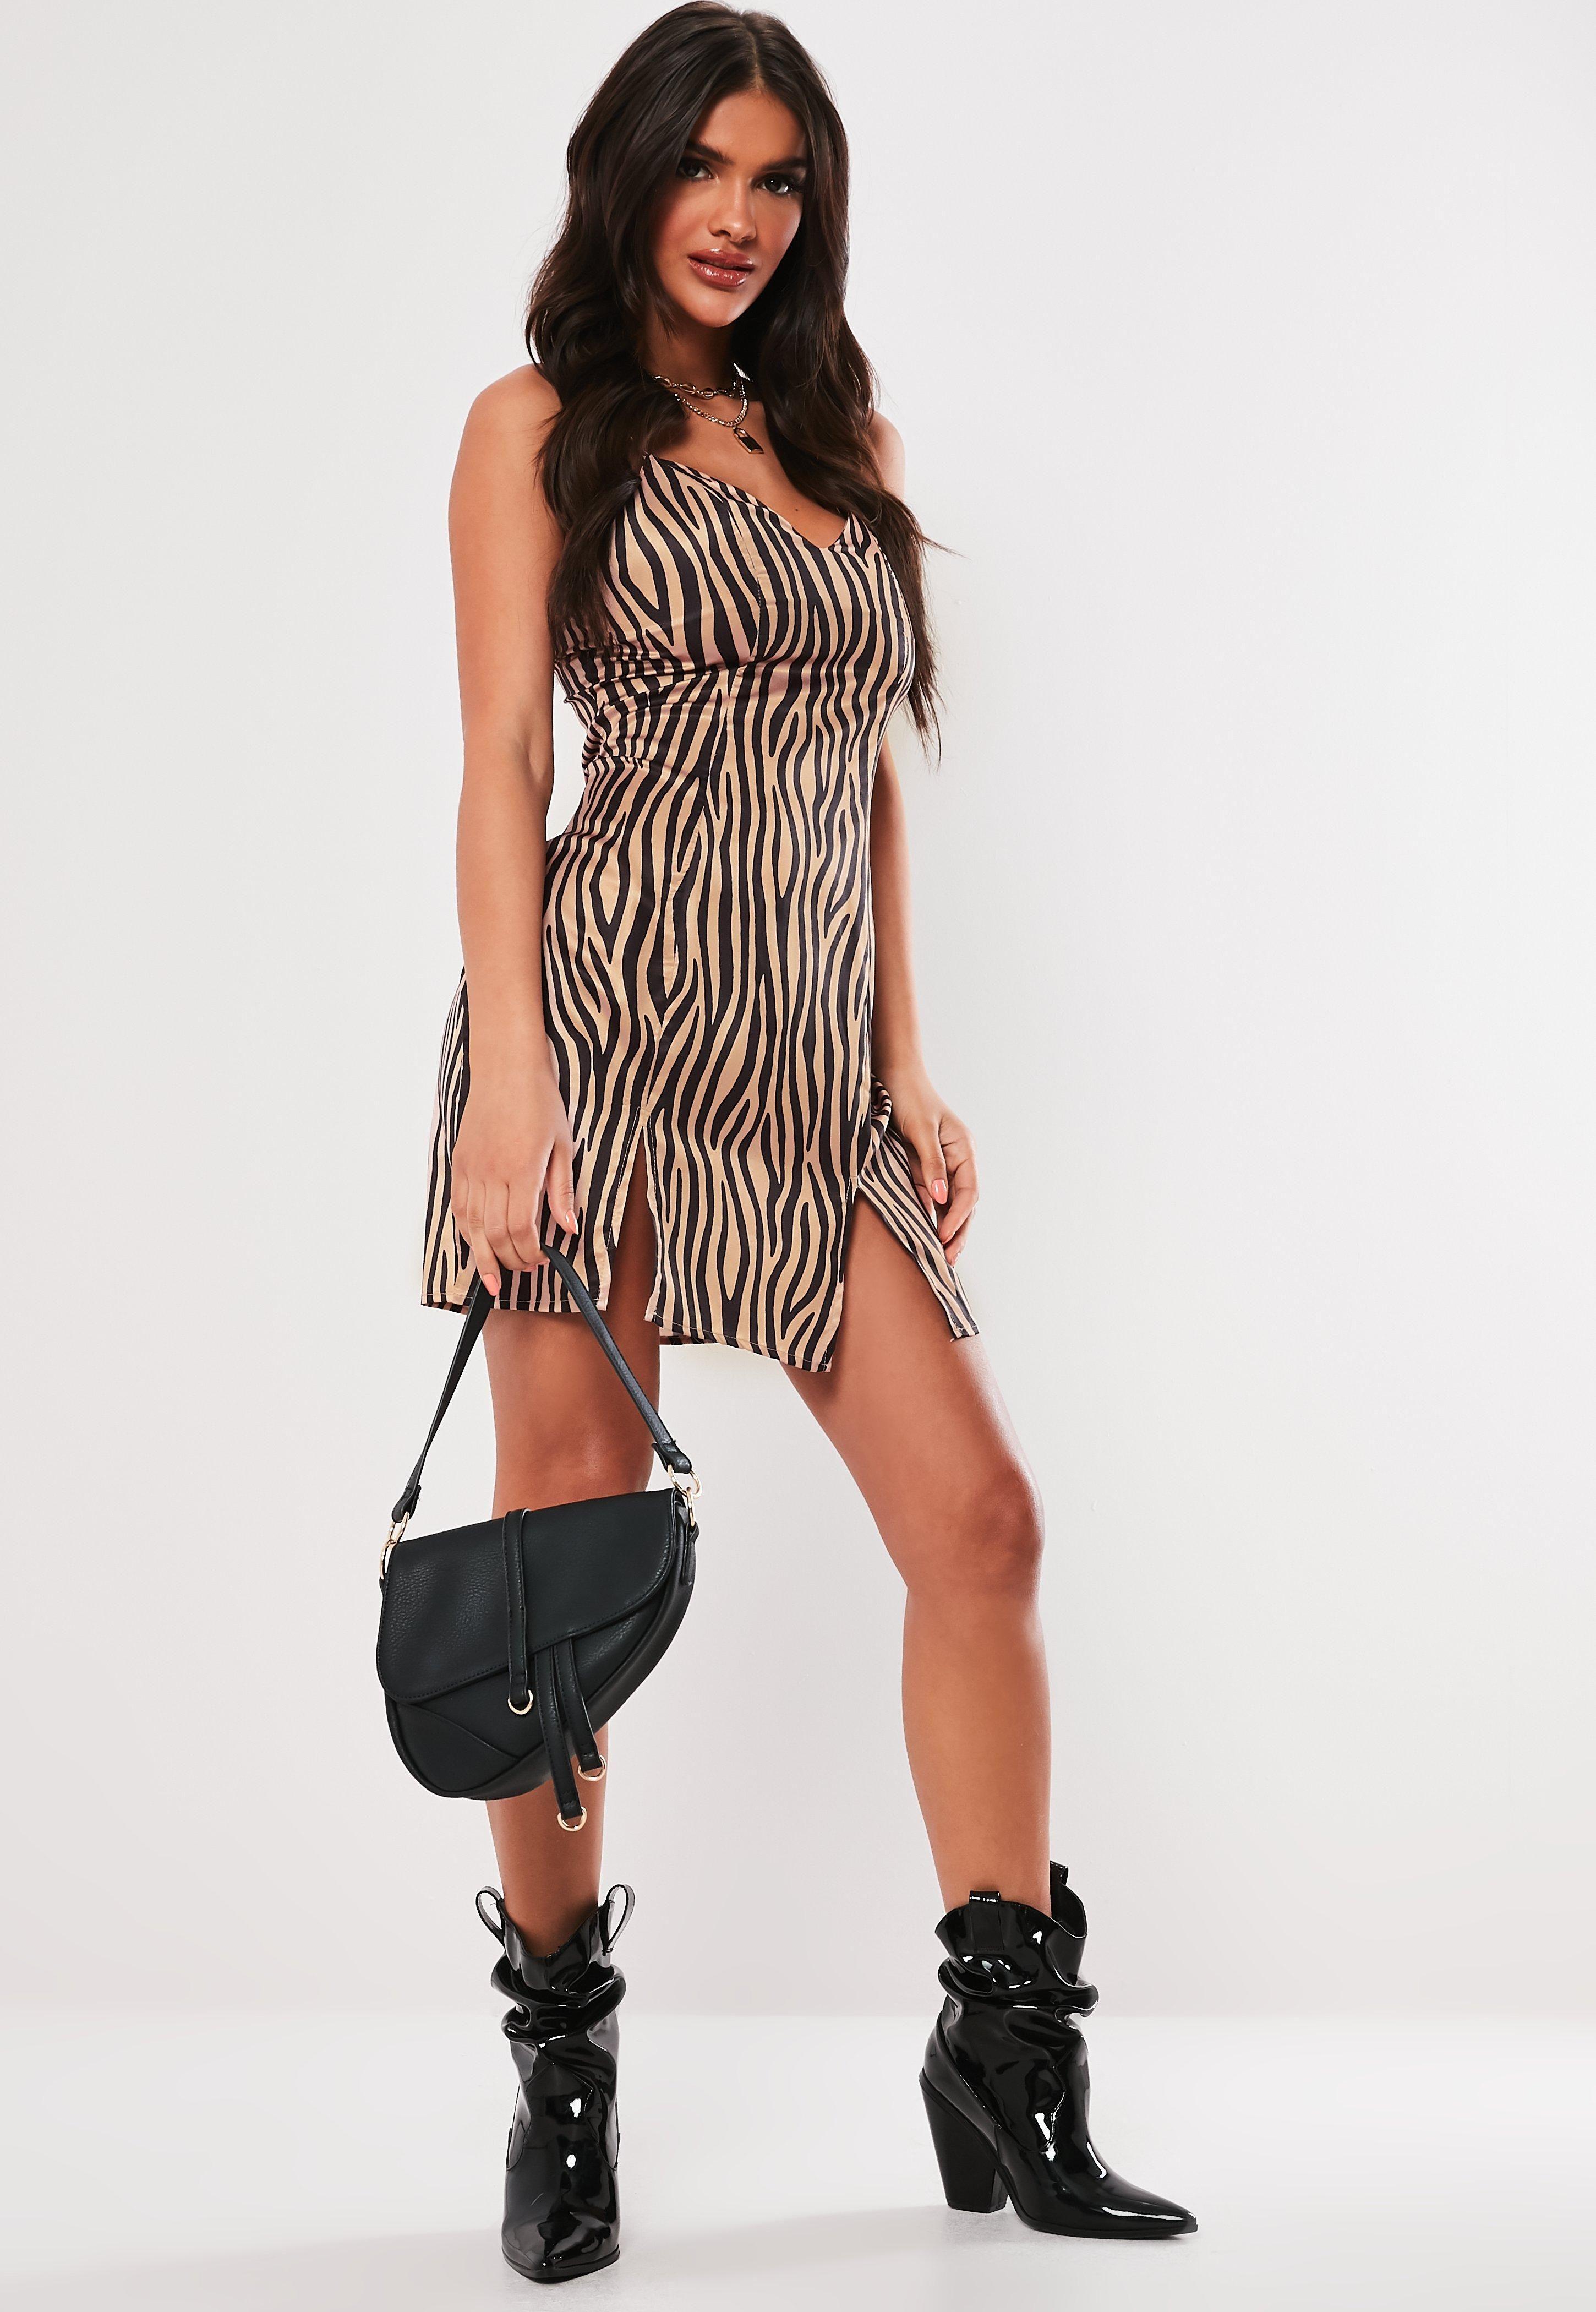 32e6b4452061 Brown Zebra Print Satin Split Front Mini Dress #Sponsored #Print, #Ad,  #Satin, #Brown